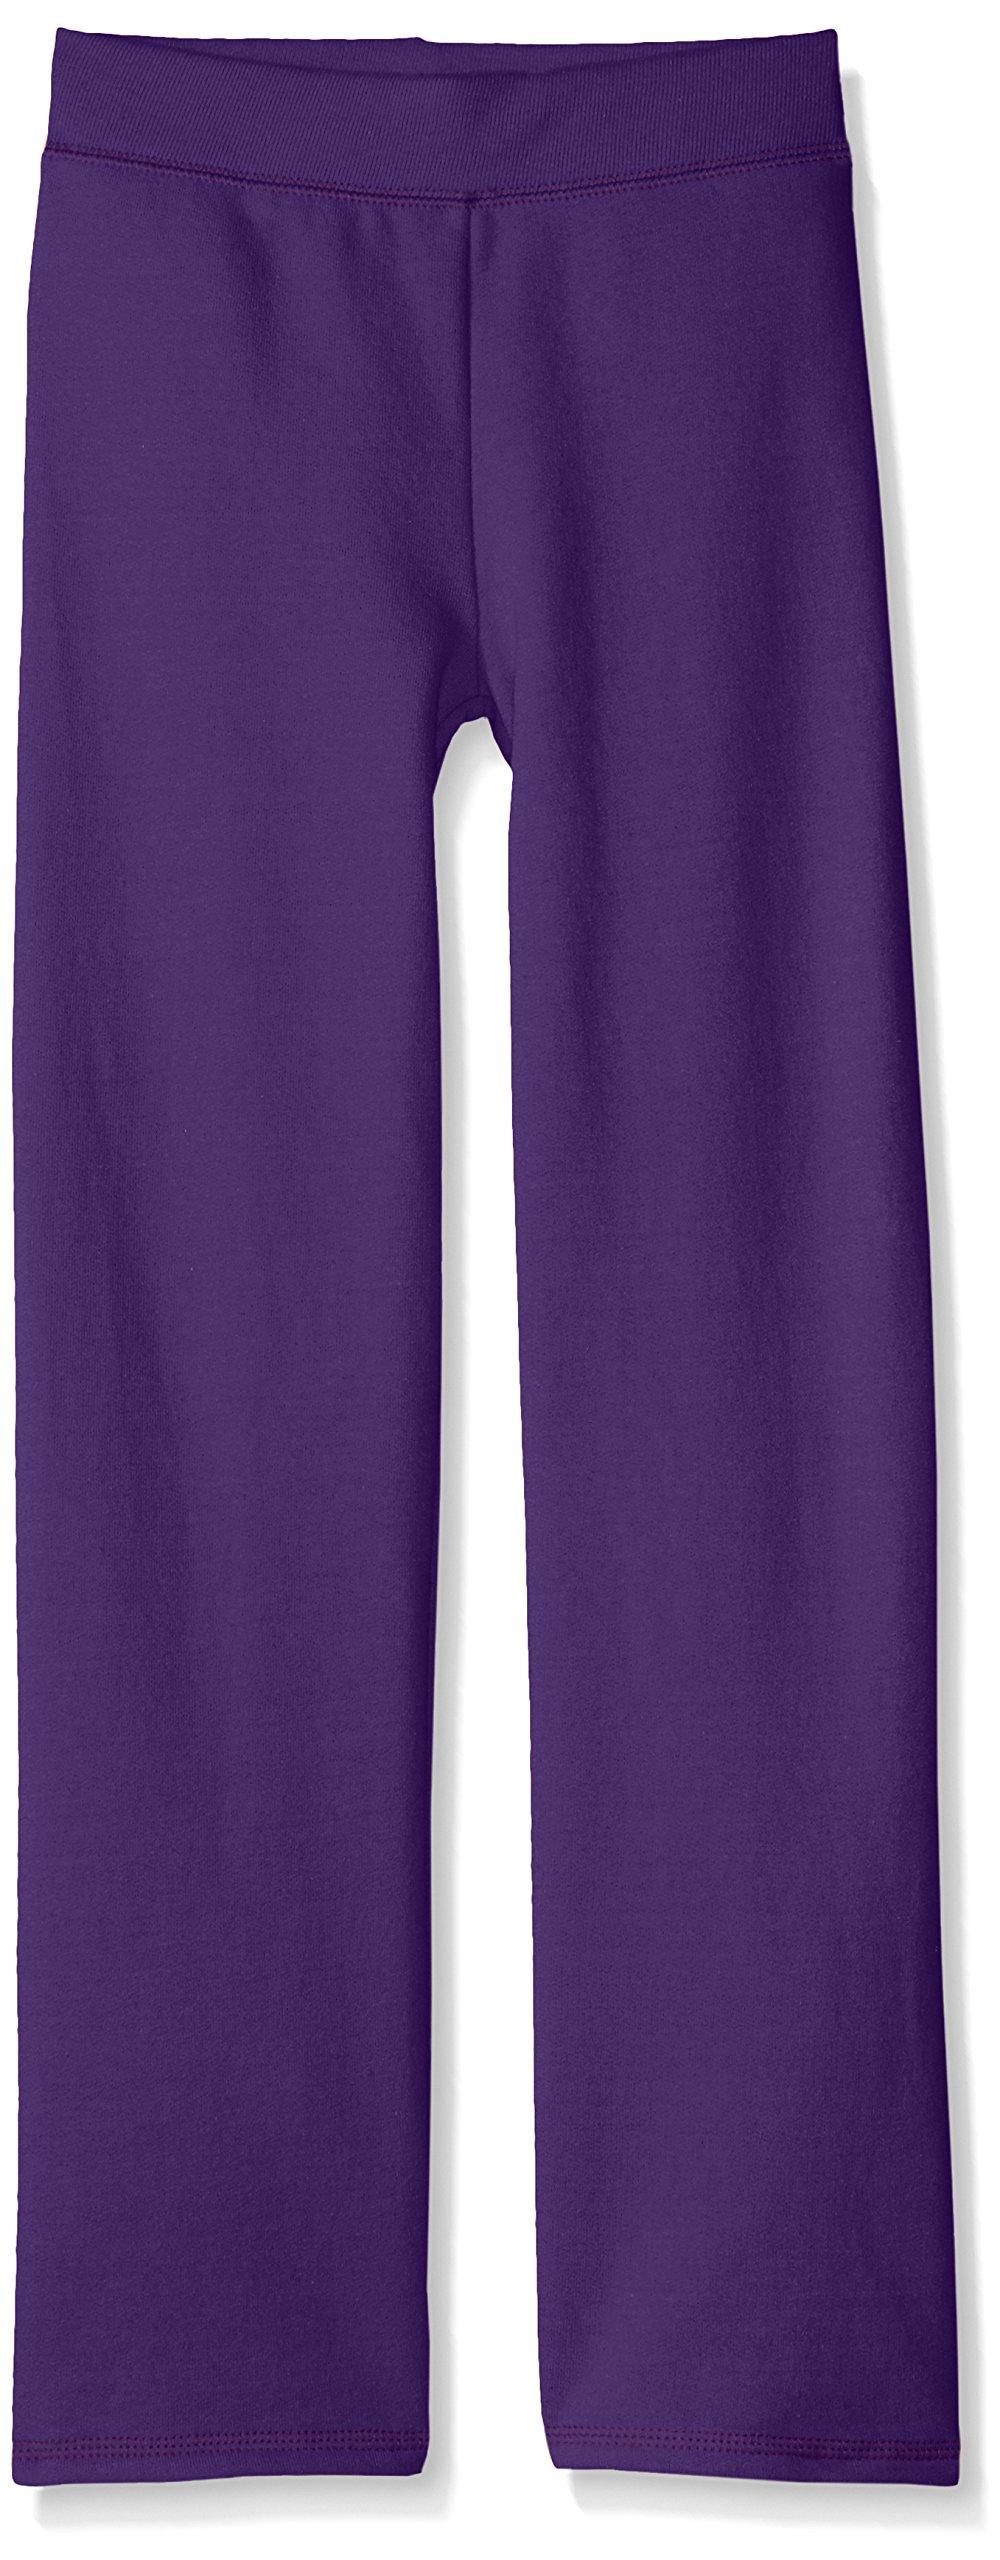 Hanes Girls' Big Girls' ComfortSoft EcoSmart Open Bottom Fleece Sweatpant, Purple Thora, L